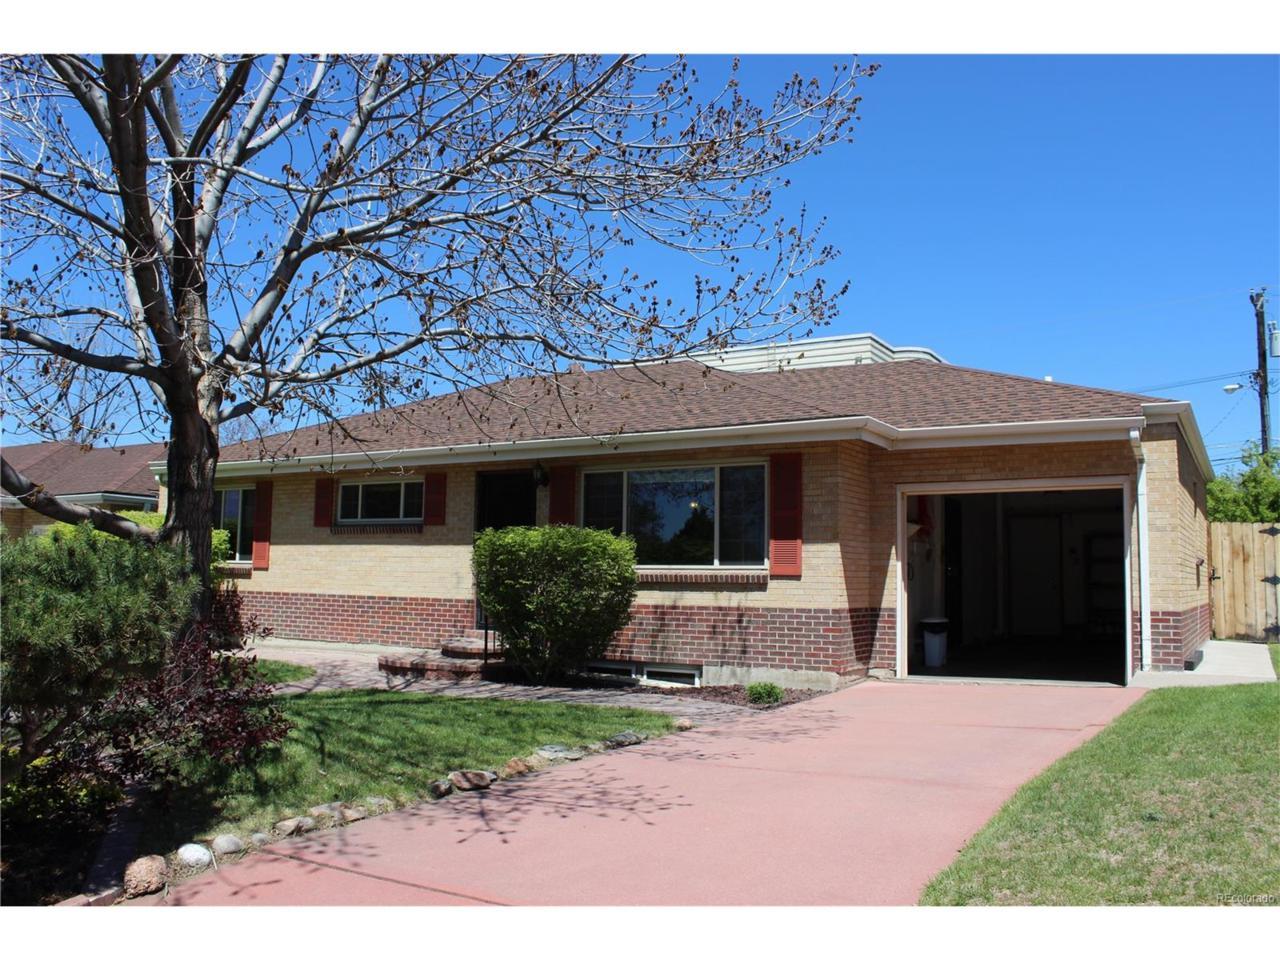 5545 E Amherst Avenue, Denver, CO 80222 (MLS #2626846) :: 8z Real Estate